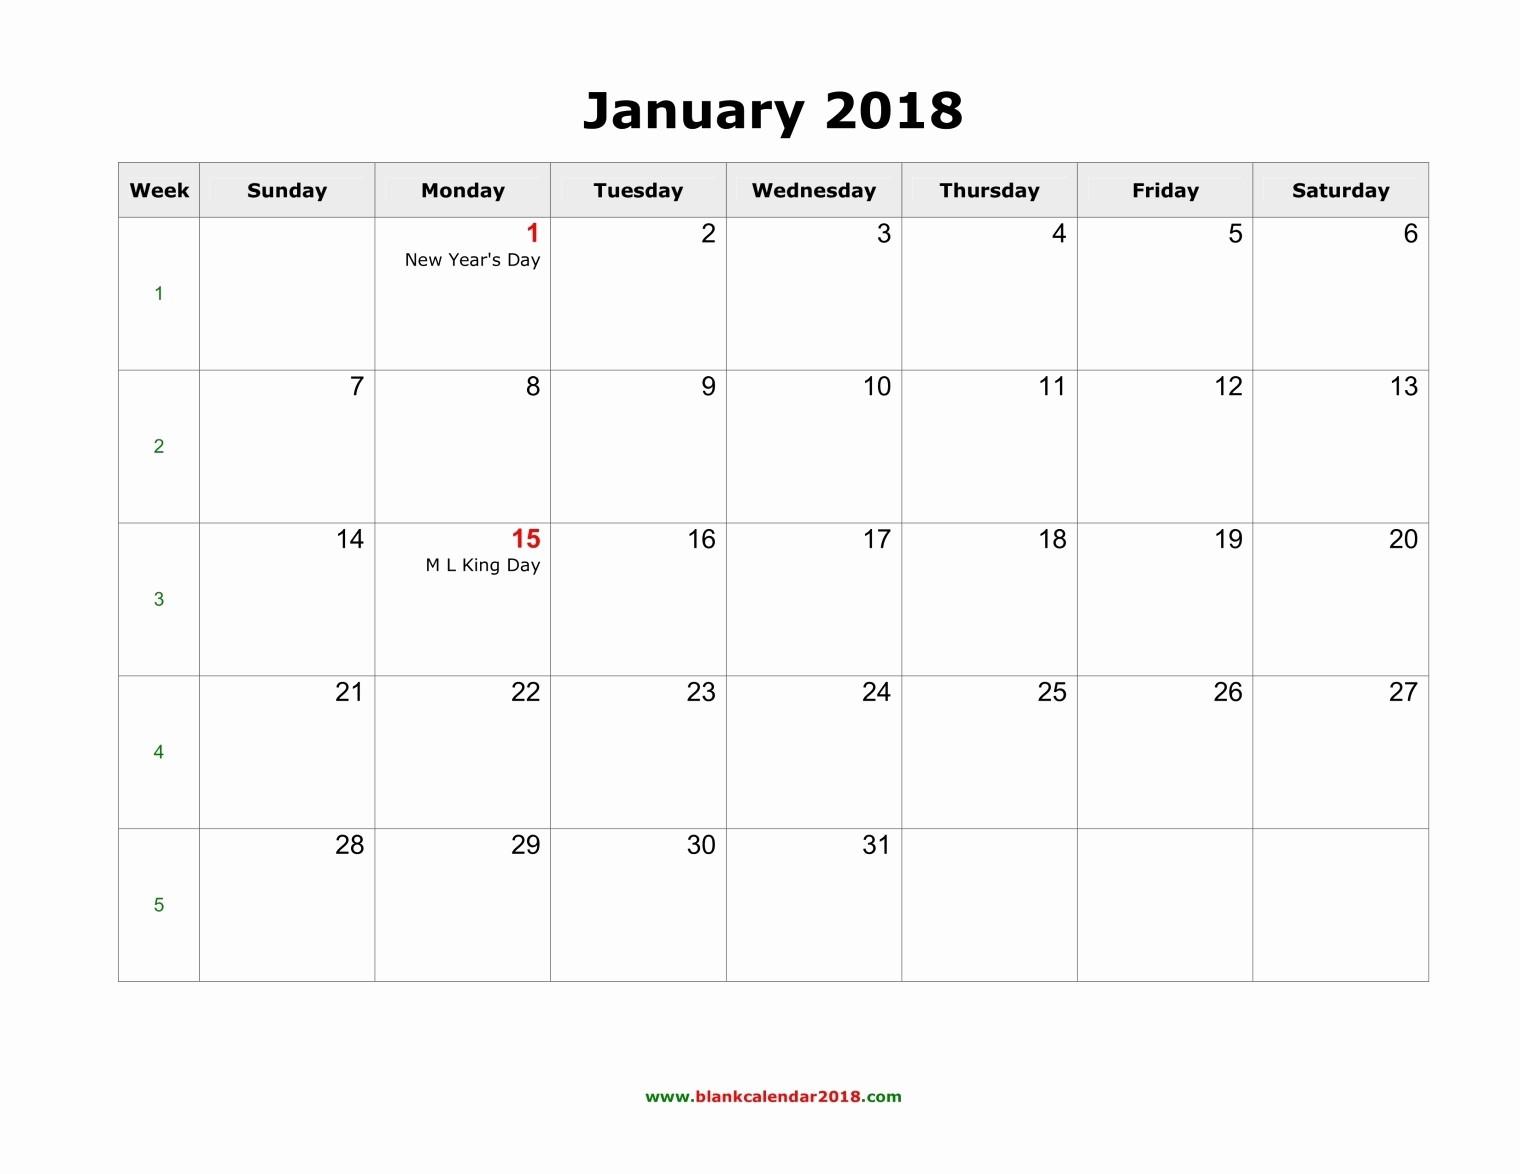 Calendar 2018 Printable with Holidays New January 2018 Calendar with Holidays